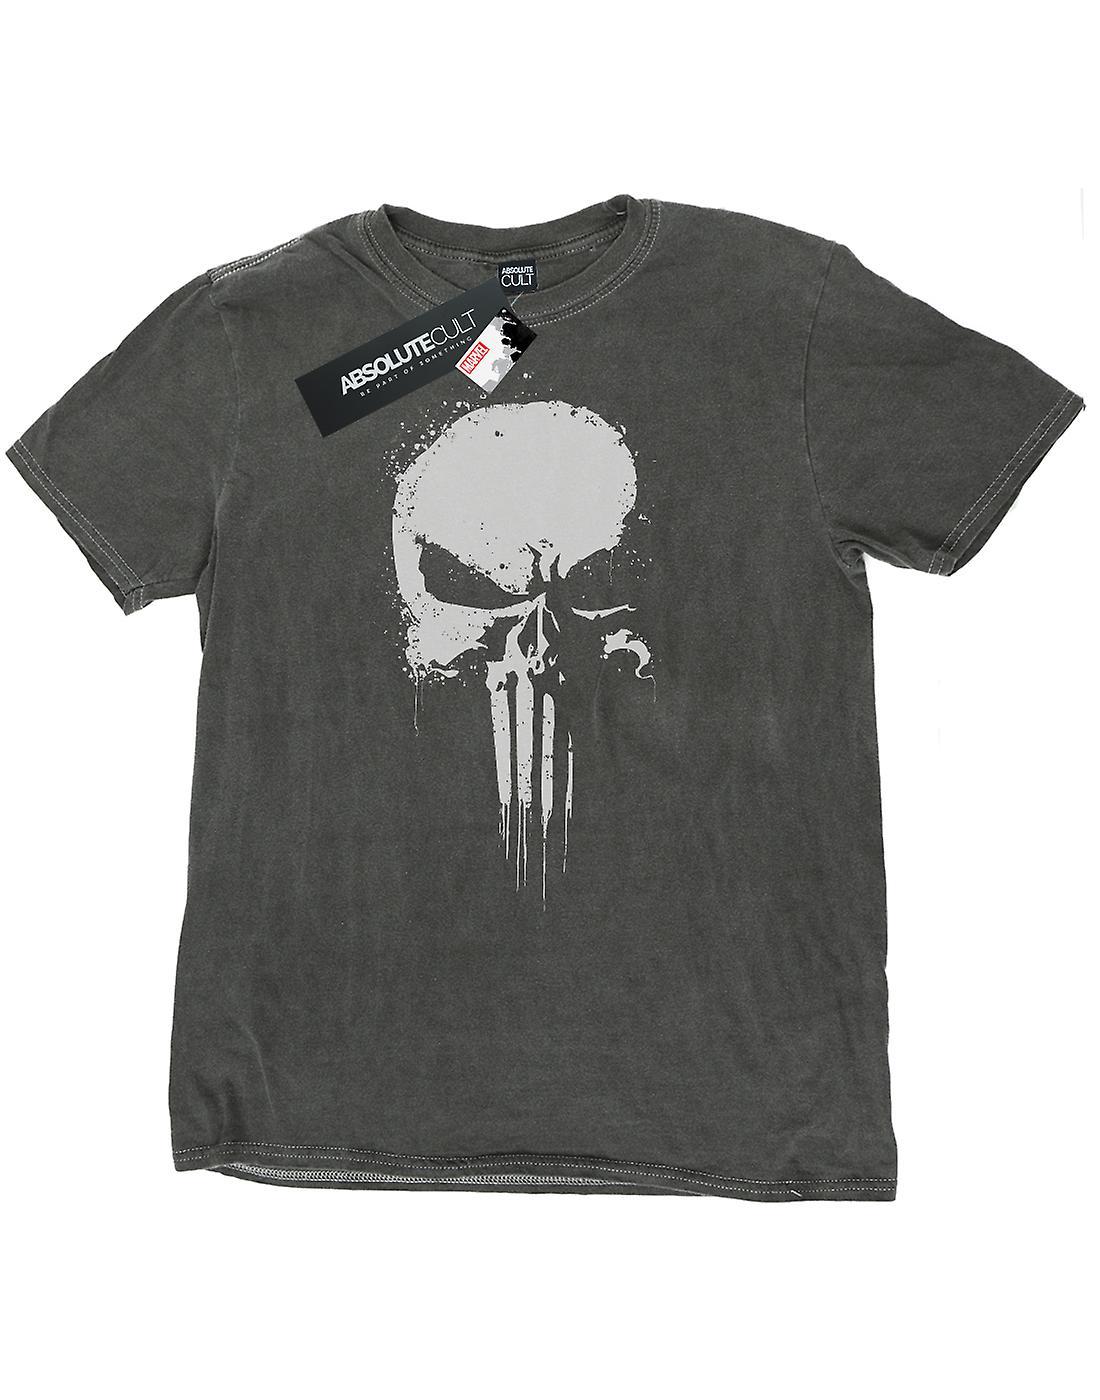 Marvel Men's The Punisher Spray Skull Washed T-Shirt